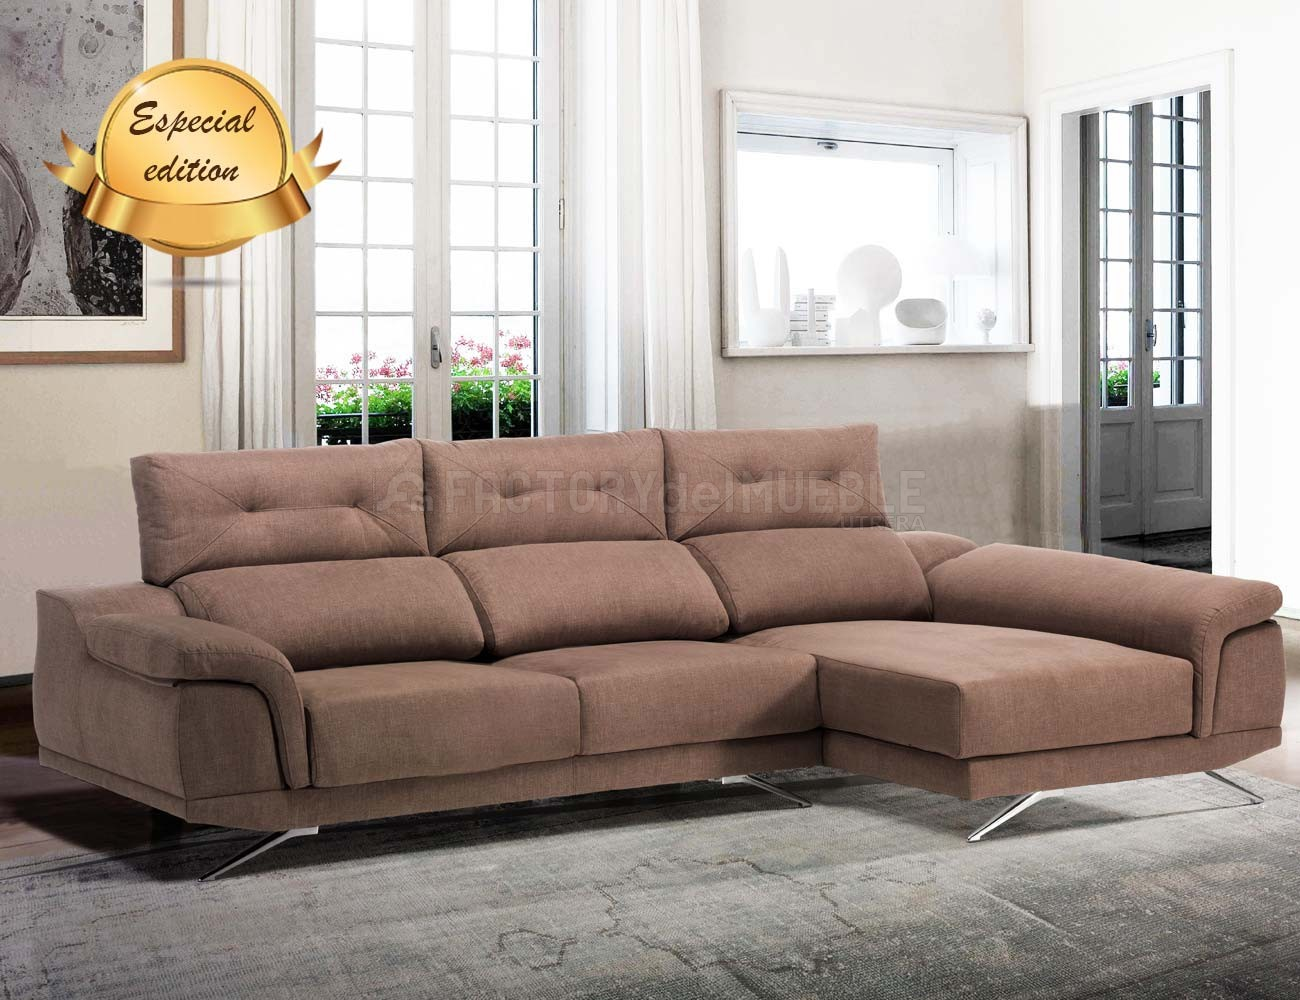 Sofa chaiselongue florencia1